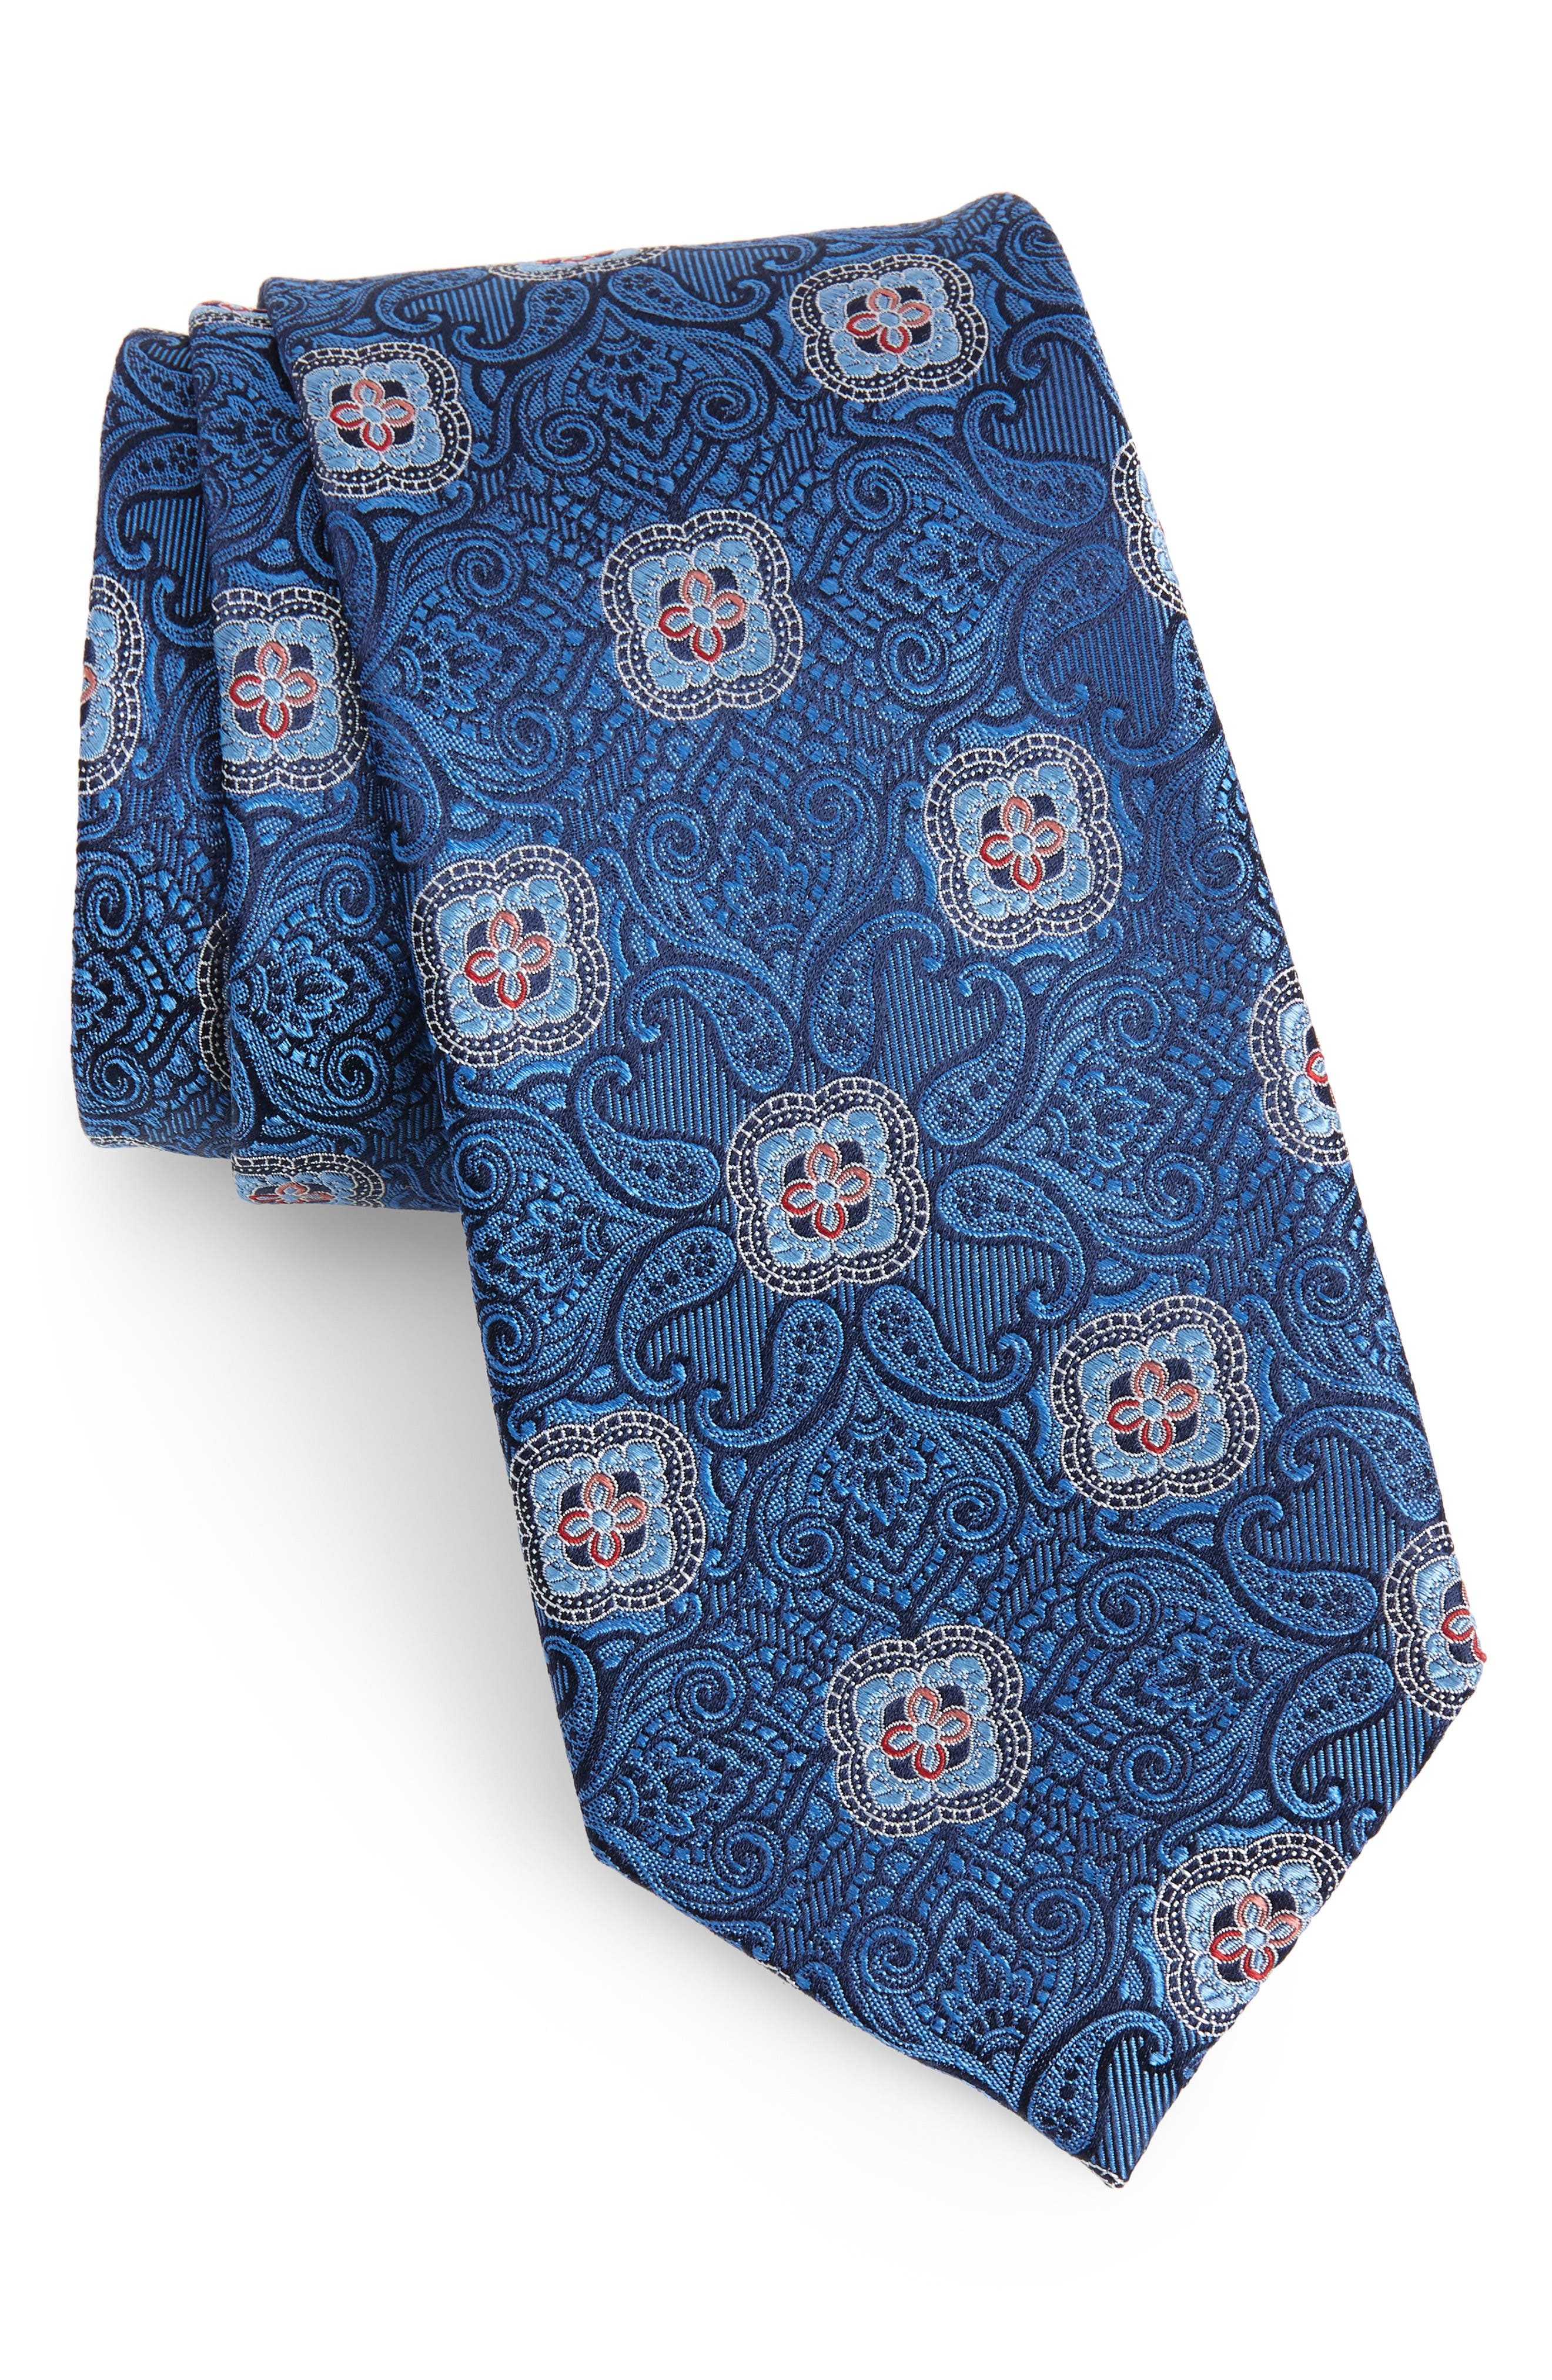 Alvarez Medallion Silk Tie,                         Main,                         color, Blue